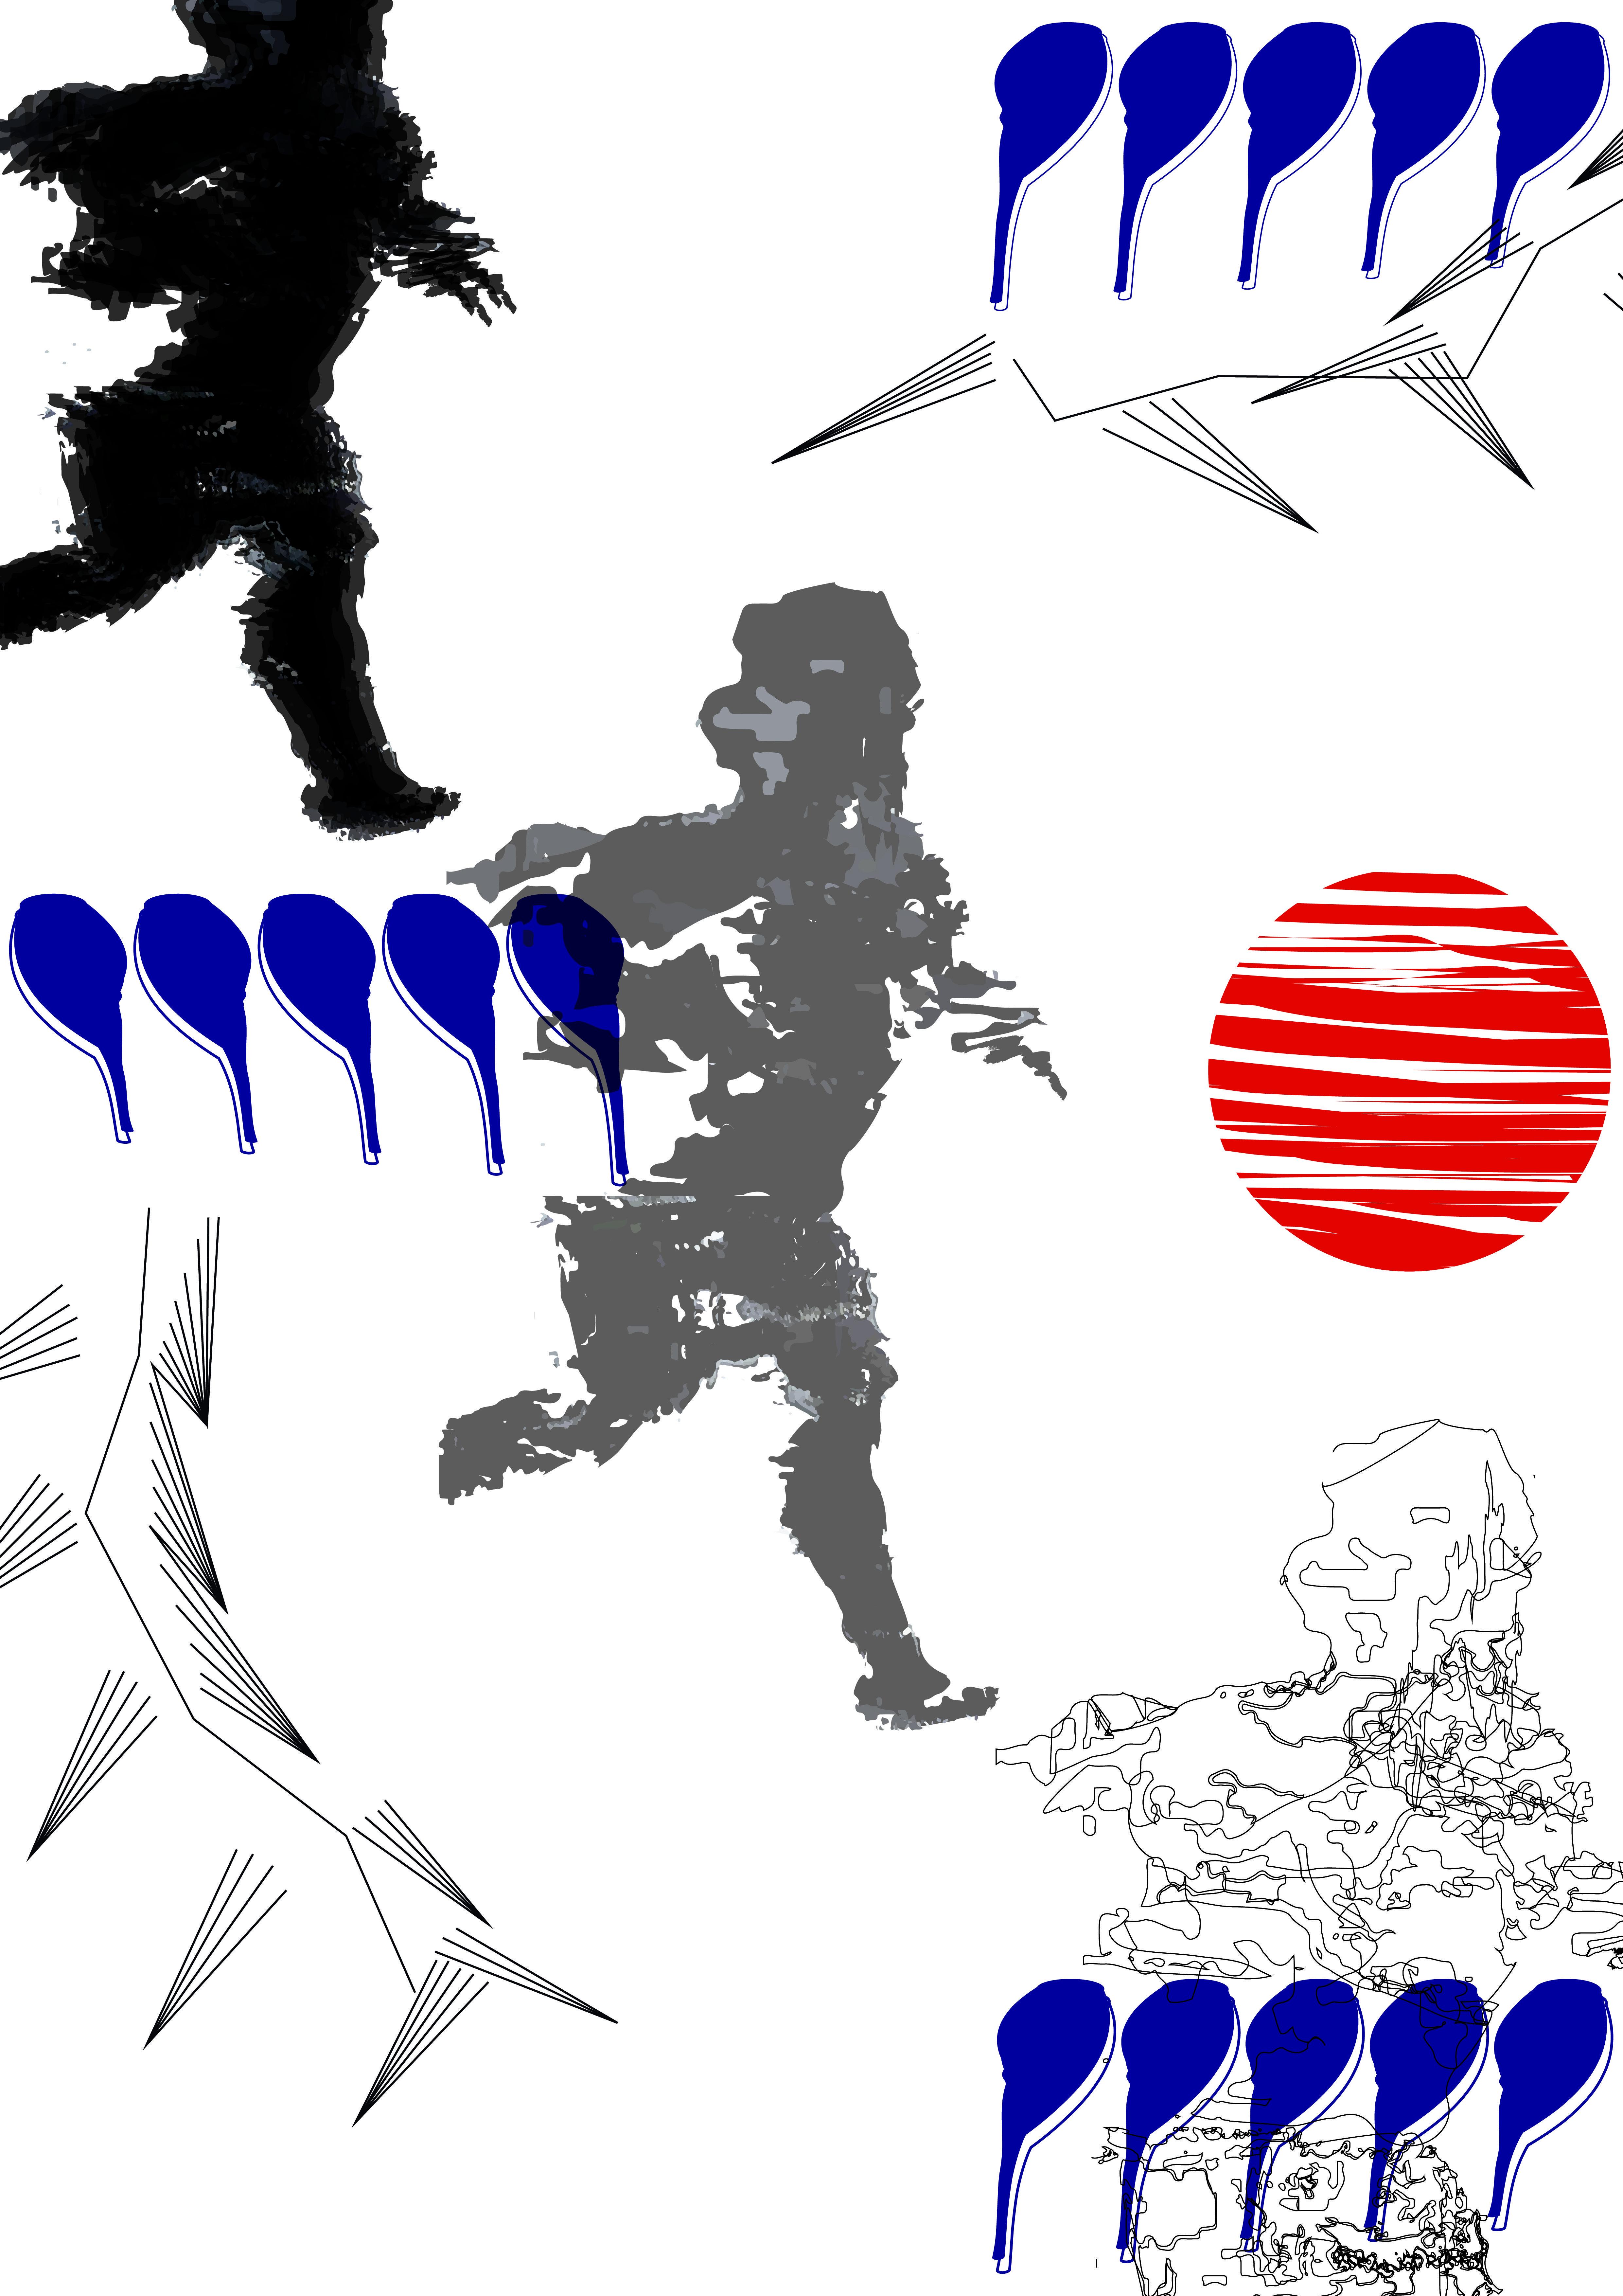 Project 포스터 01 디벨롭 01